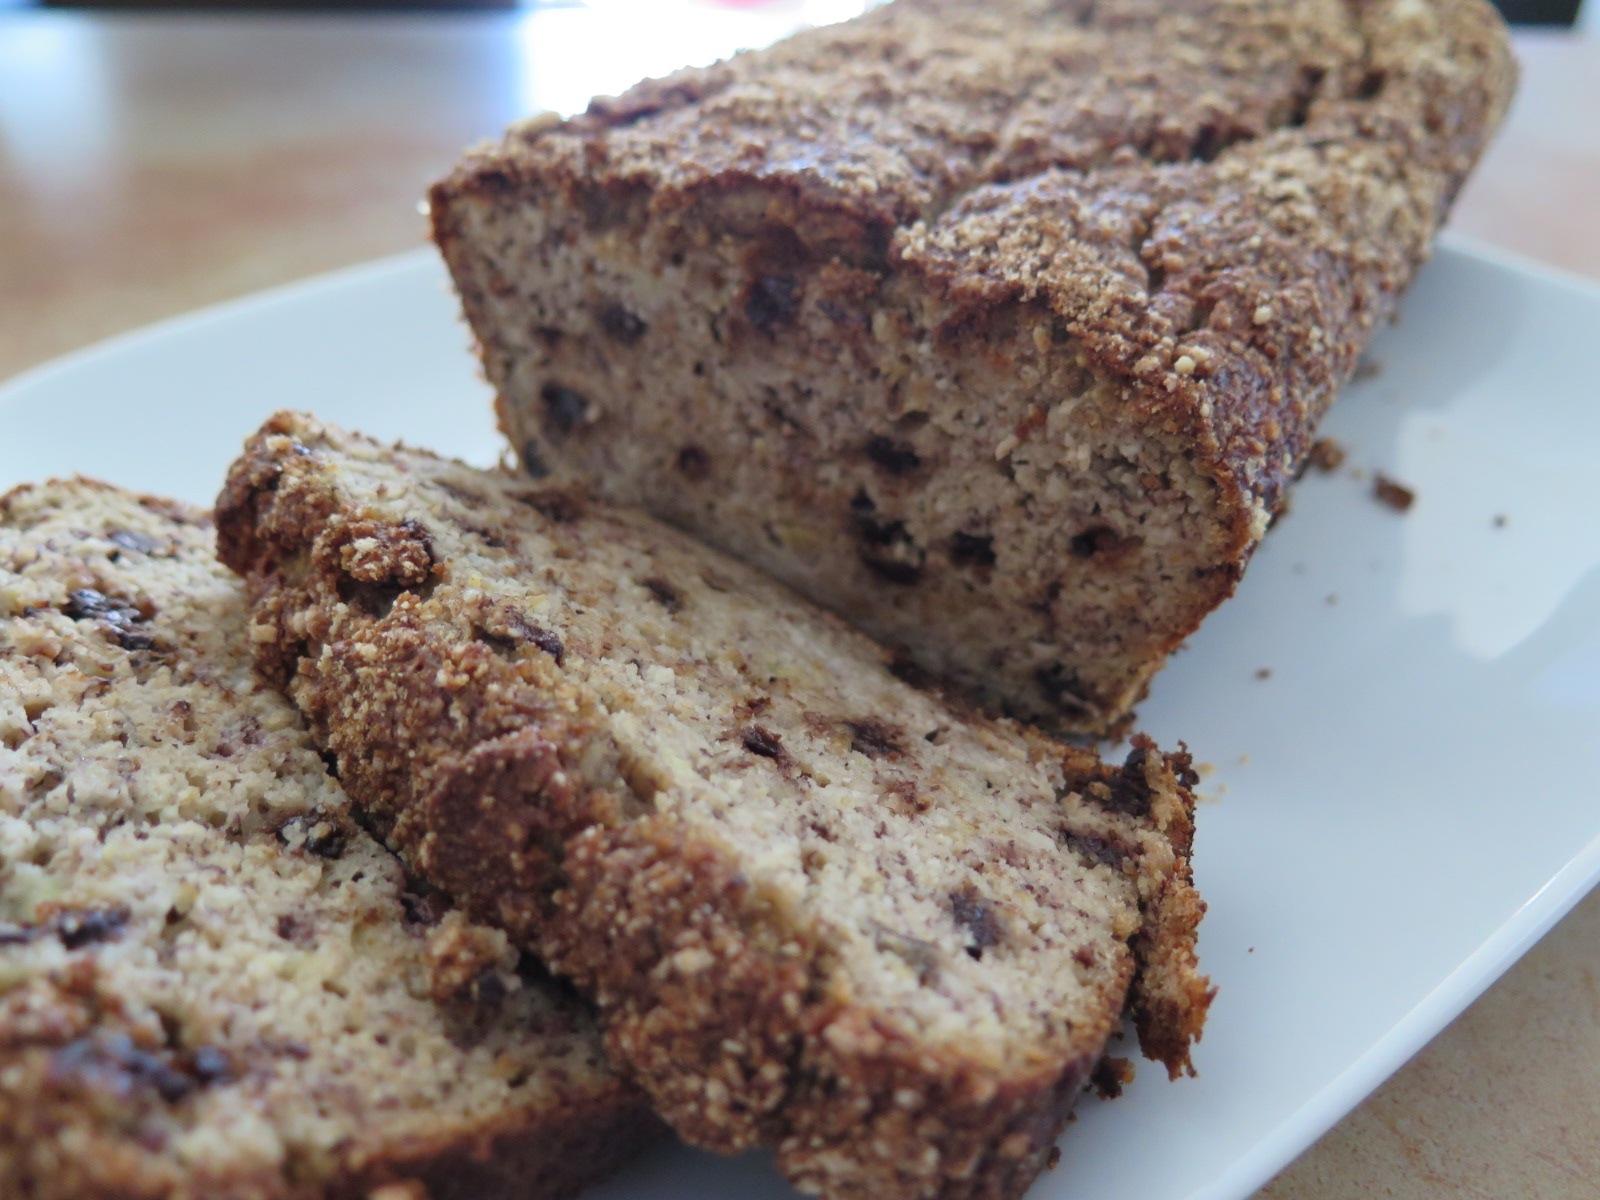 Chocolate Chip & Cinnamon Banana Bread – Paleo Style